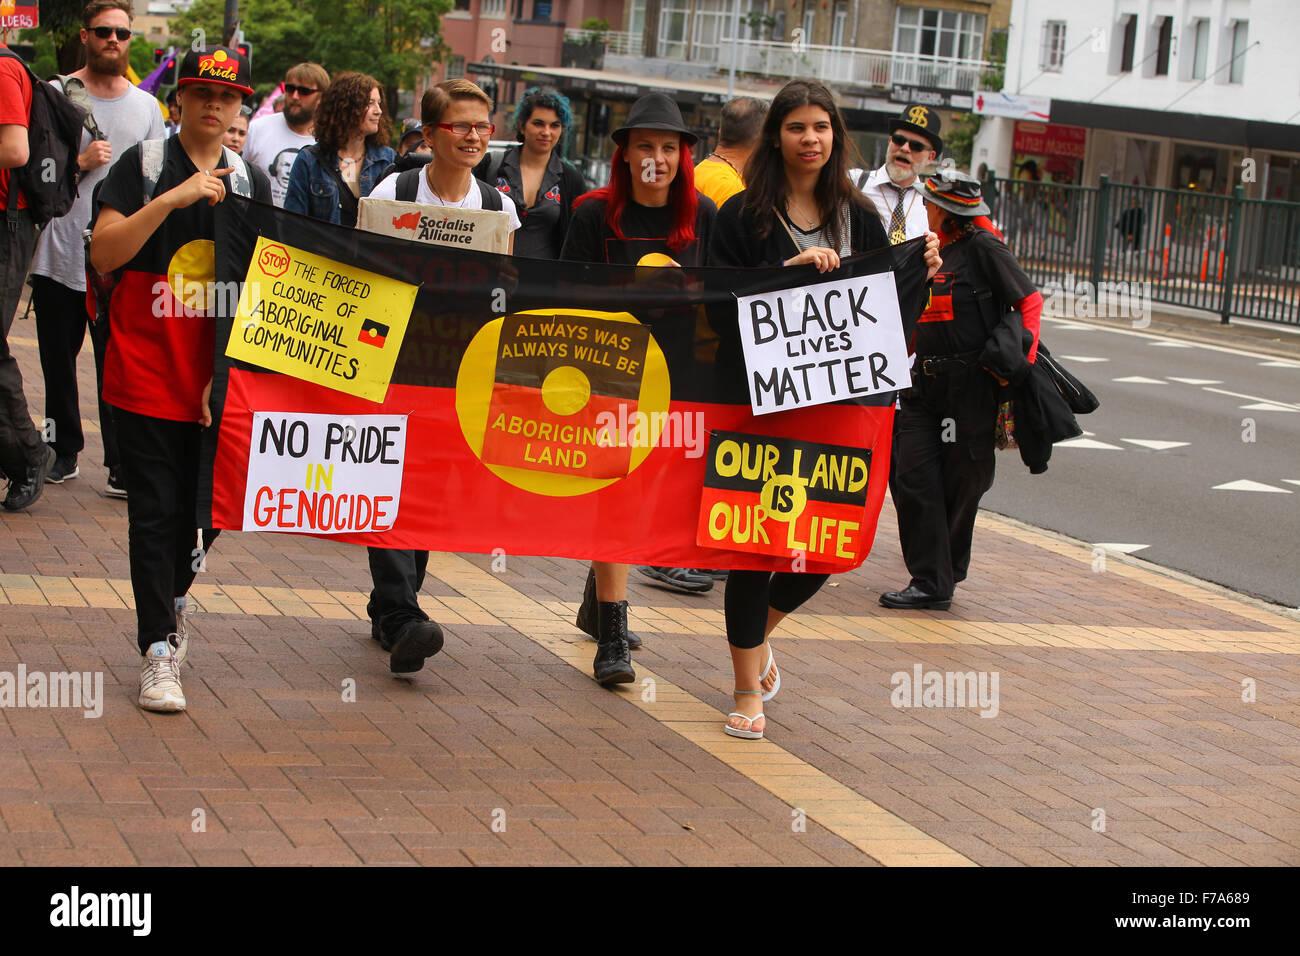 Sydney, Australia. 27th November, 2015. Protesters from the #sosblakaustralia movement rallied outside the Australian - Stock Image